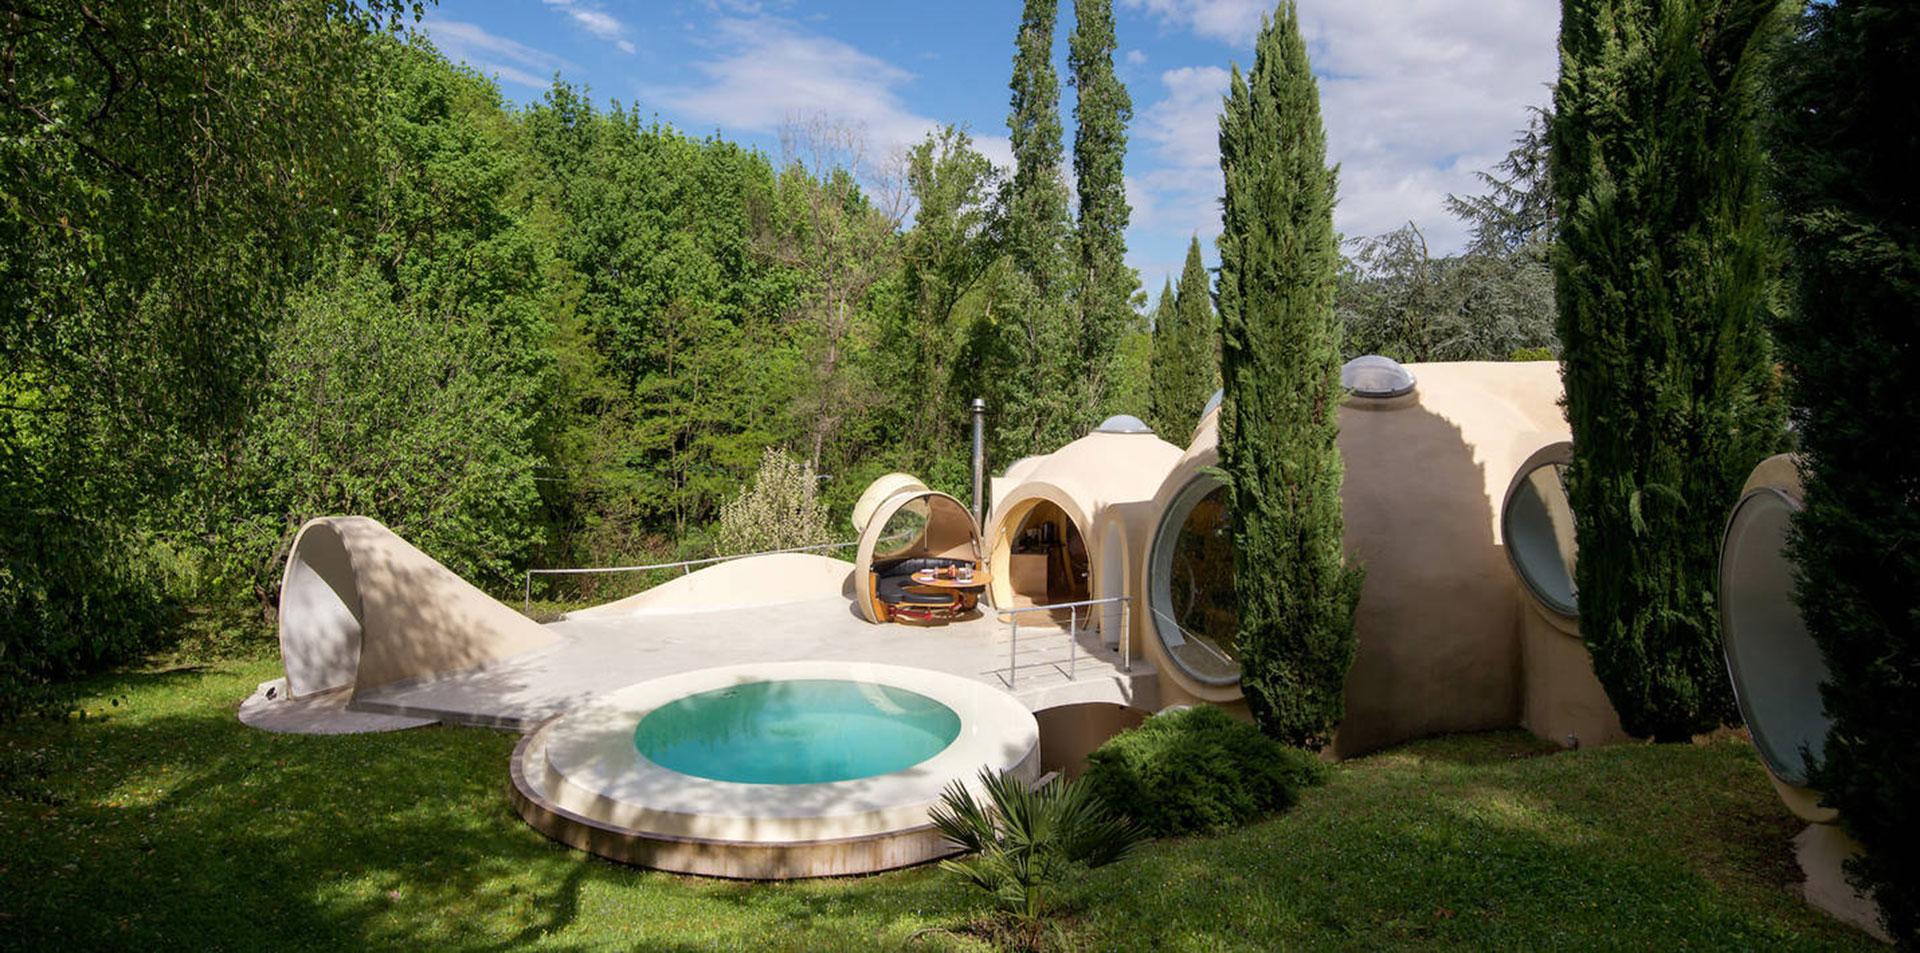 Дом по проекту Антти Ловага около Лиона